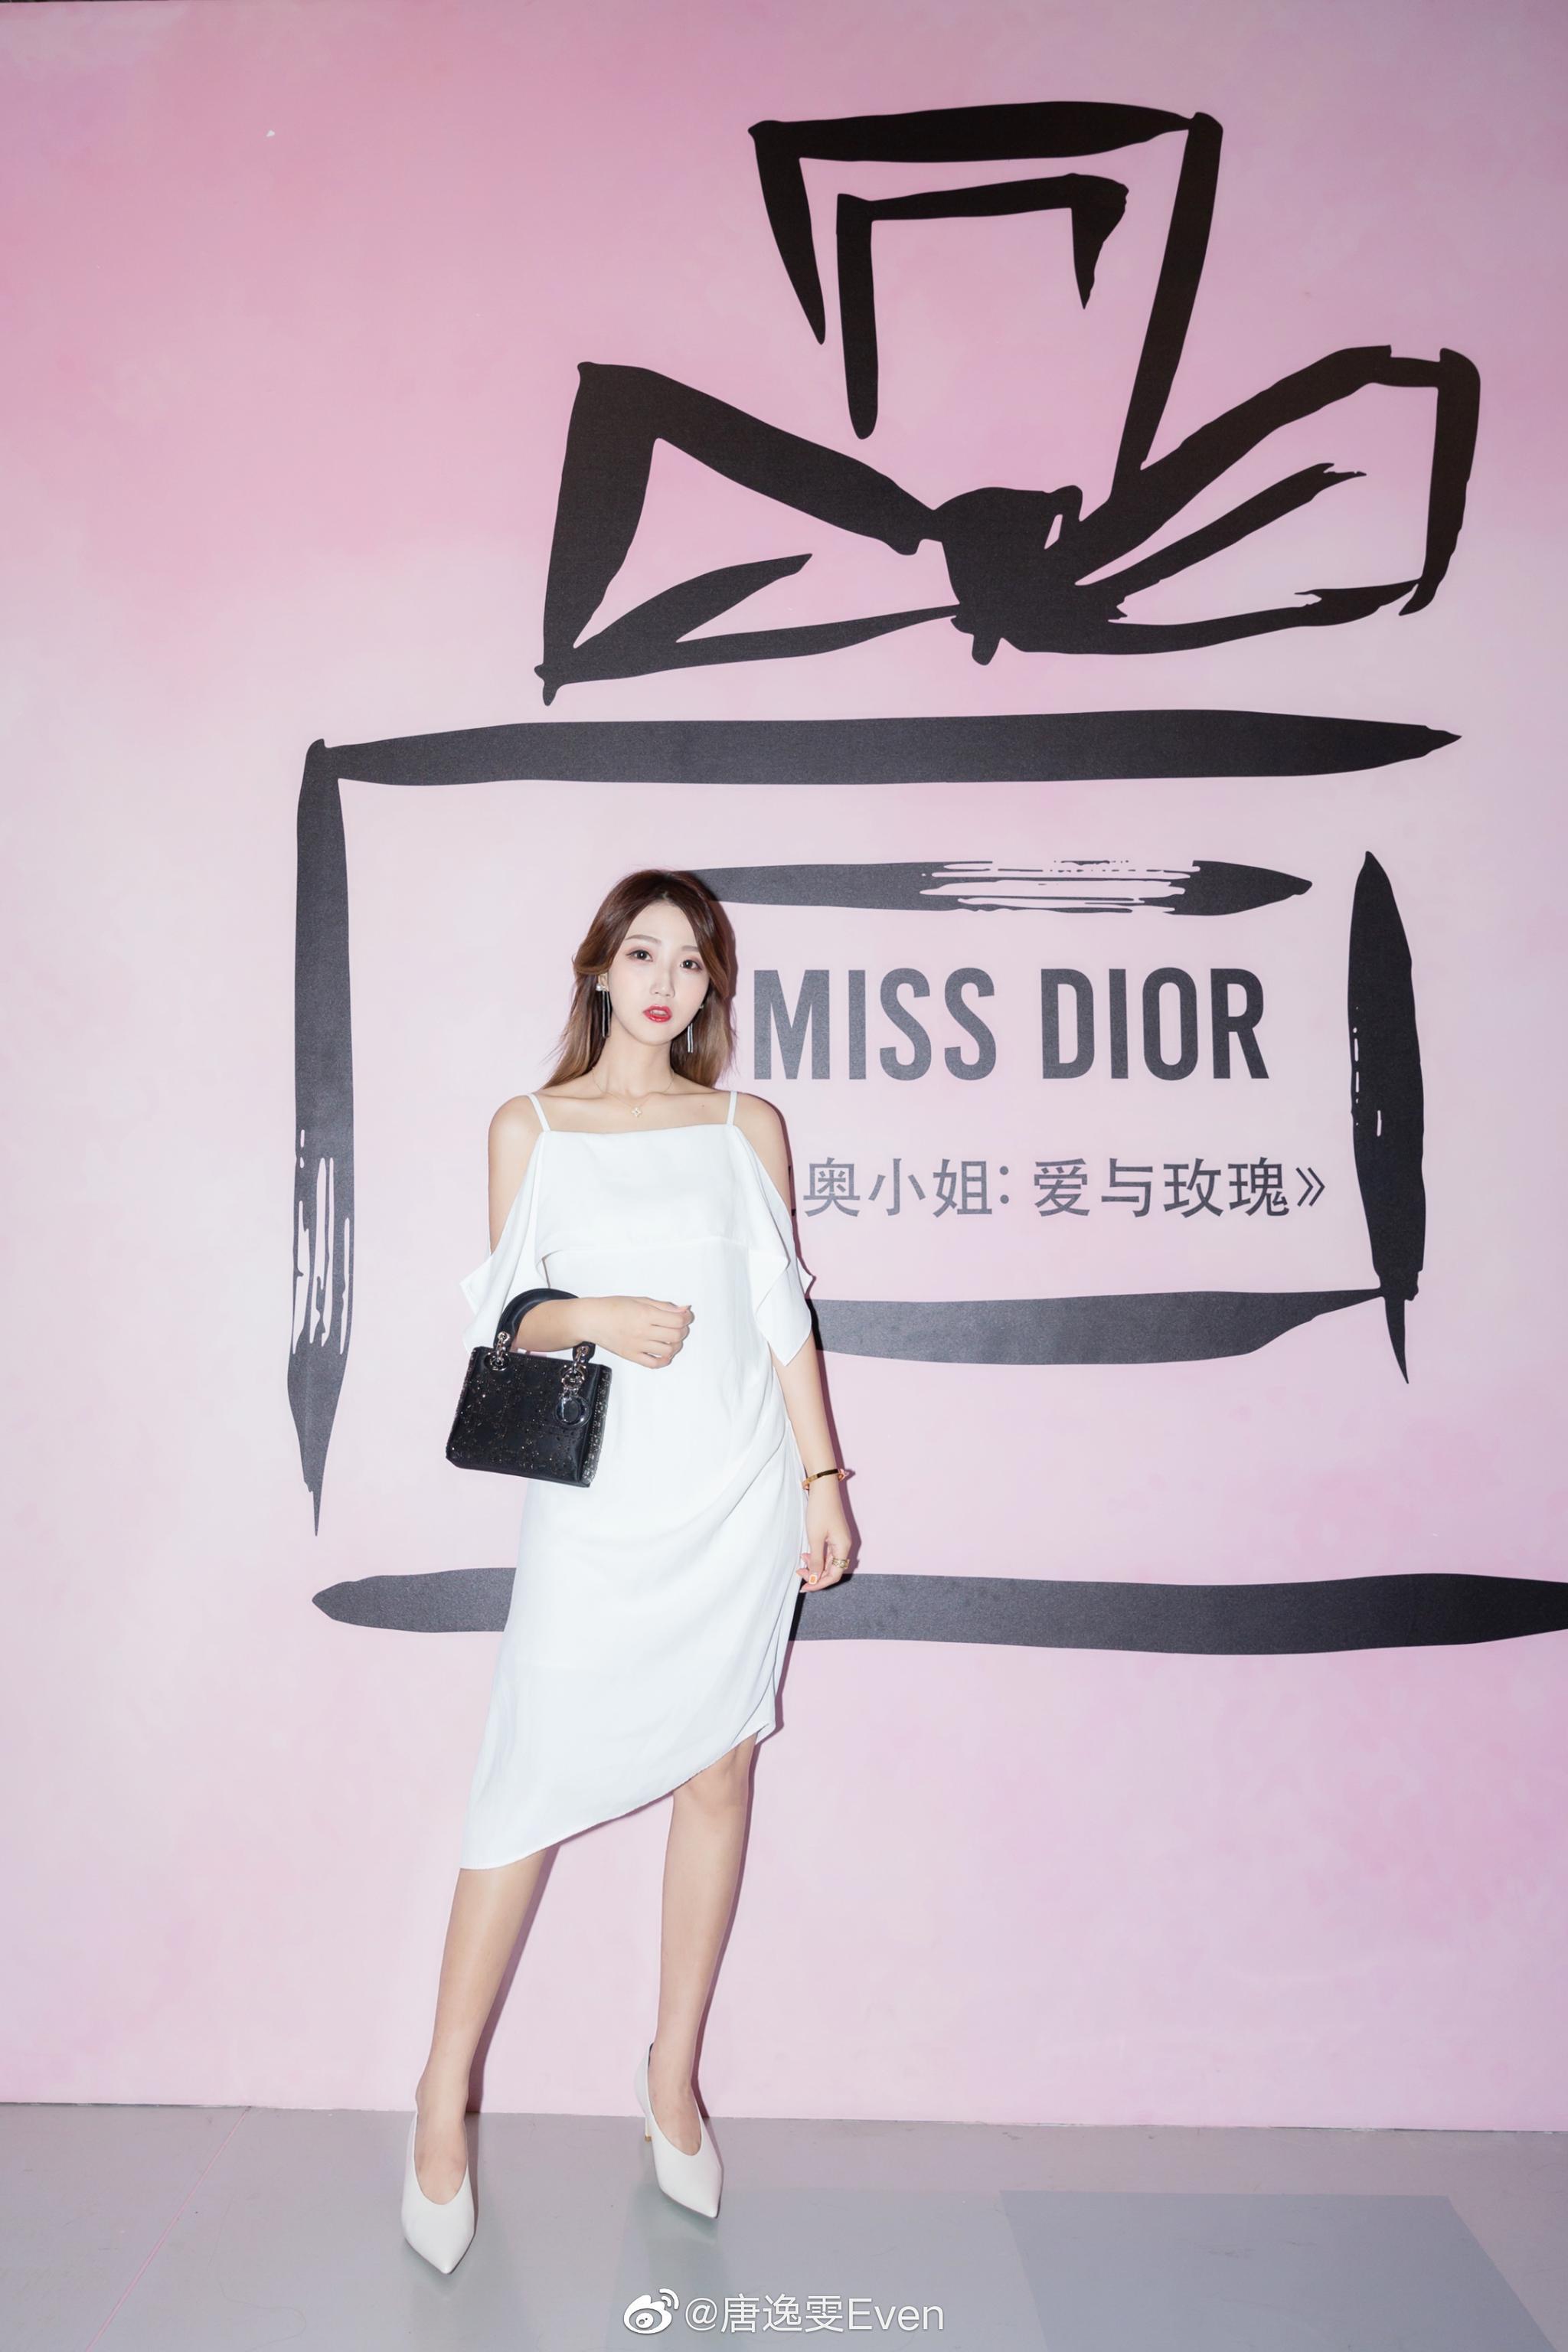 MISS DIORLOVE N'ROSES『迪奥小姐:爱与玫瑰』展览